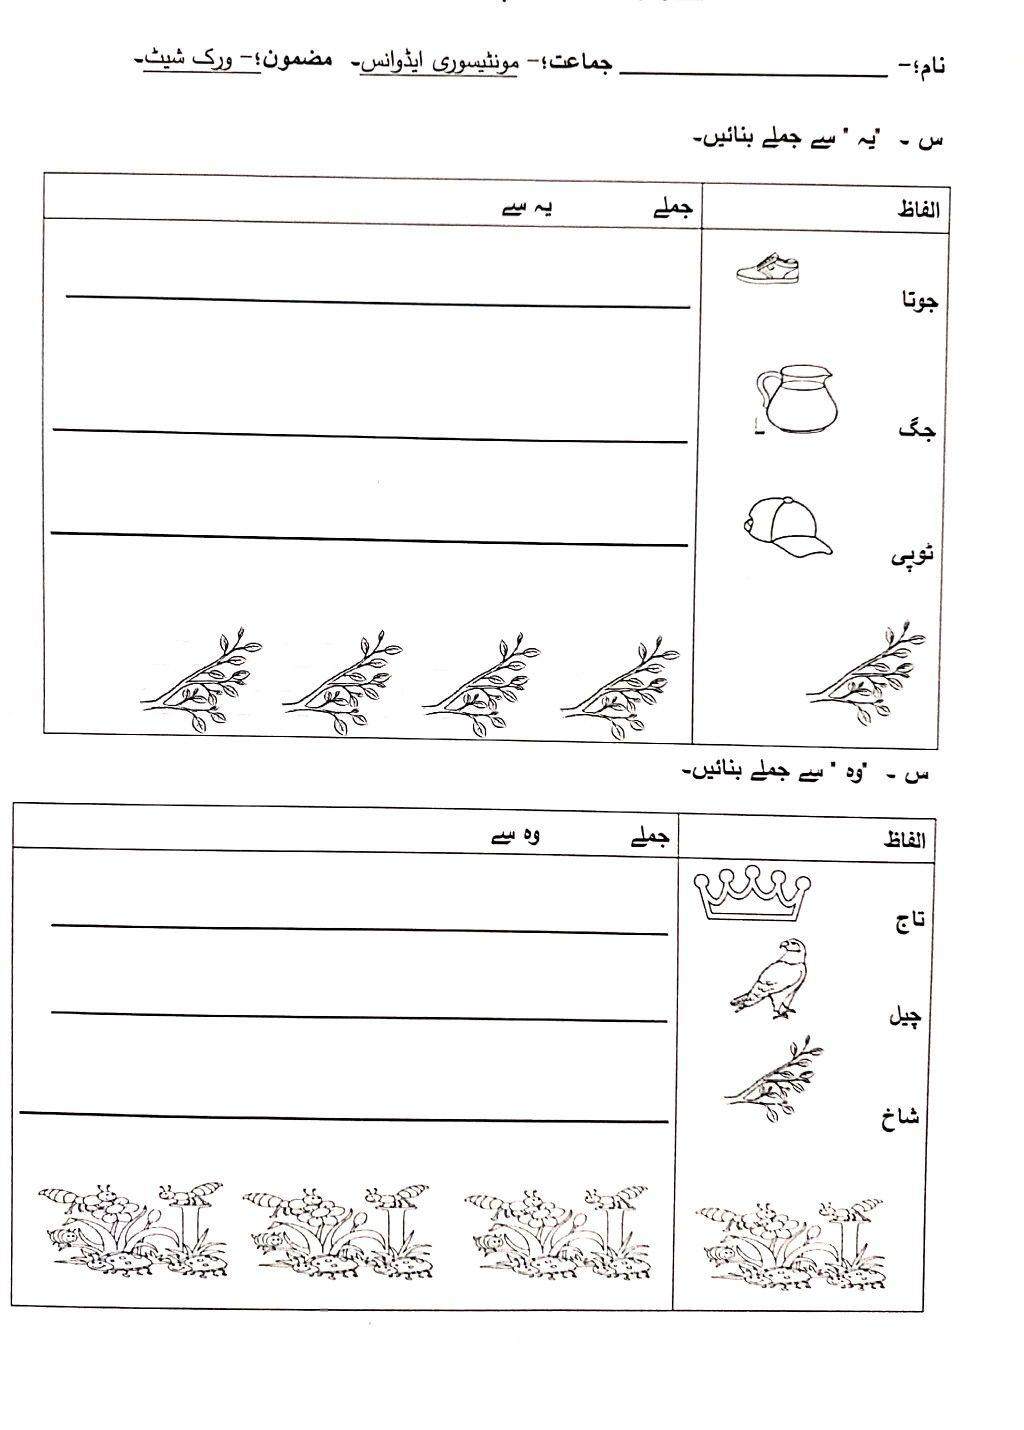 Urdu 5th Grade Worksheet   Printable Worksheets and Activities for  Teachers [ 1430 x 1024 Pixel ]